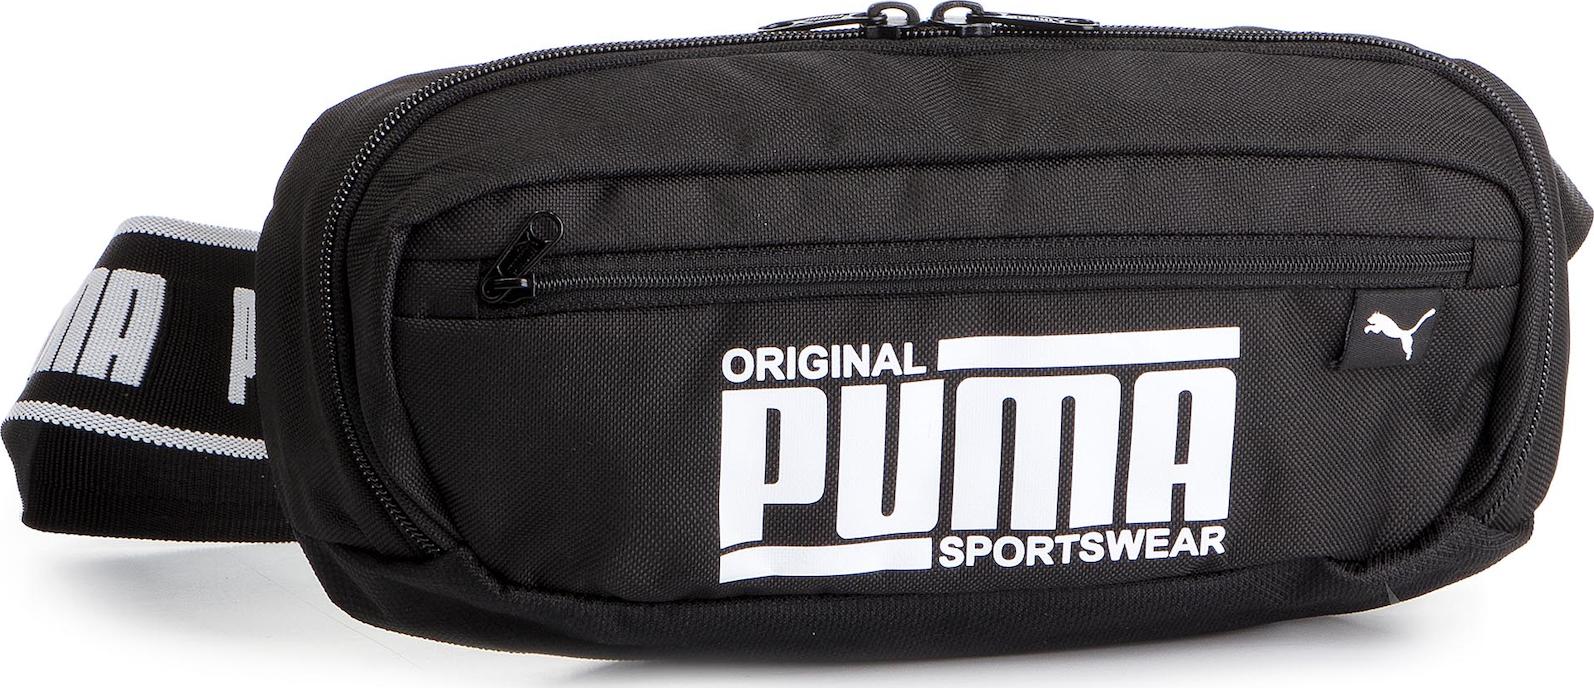 3c537b0819 Προσθήκη στα αγαπημένα menu Puma Sole Waist Bag